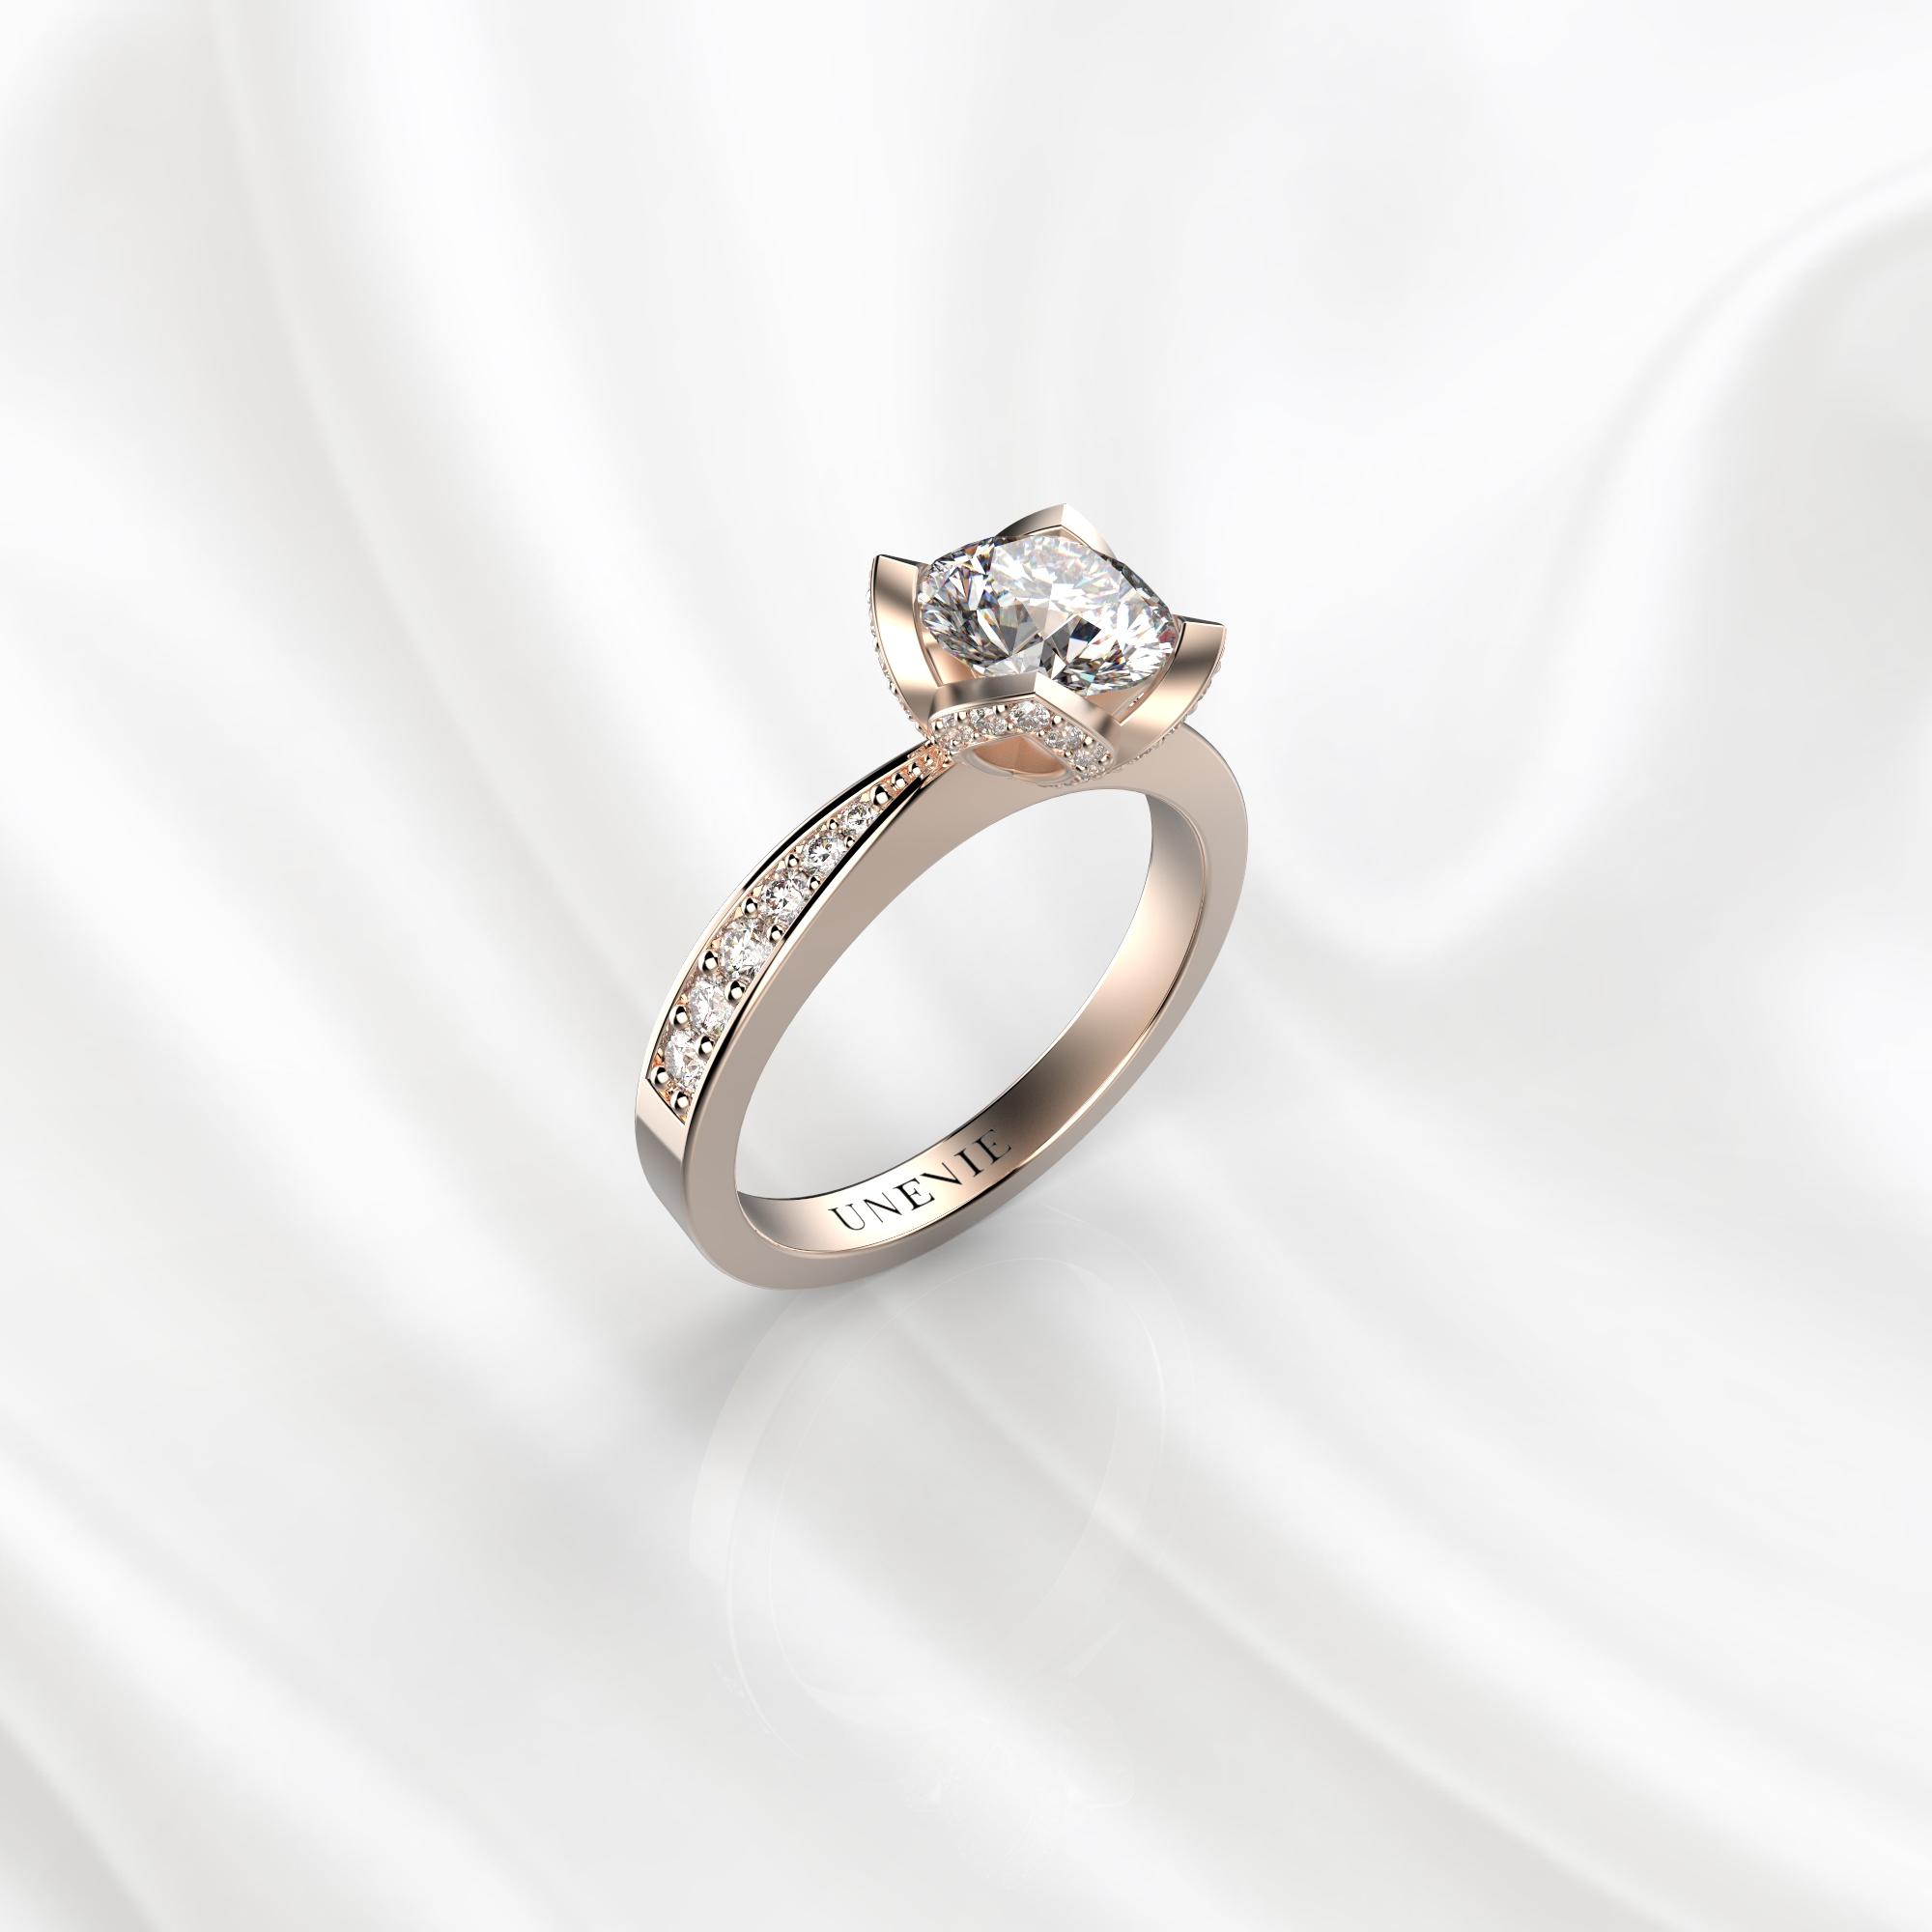 N21 Помолвочное кольцо из розового золота с бриллиантом 0.3 карат